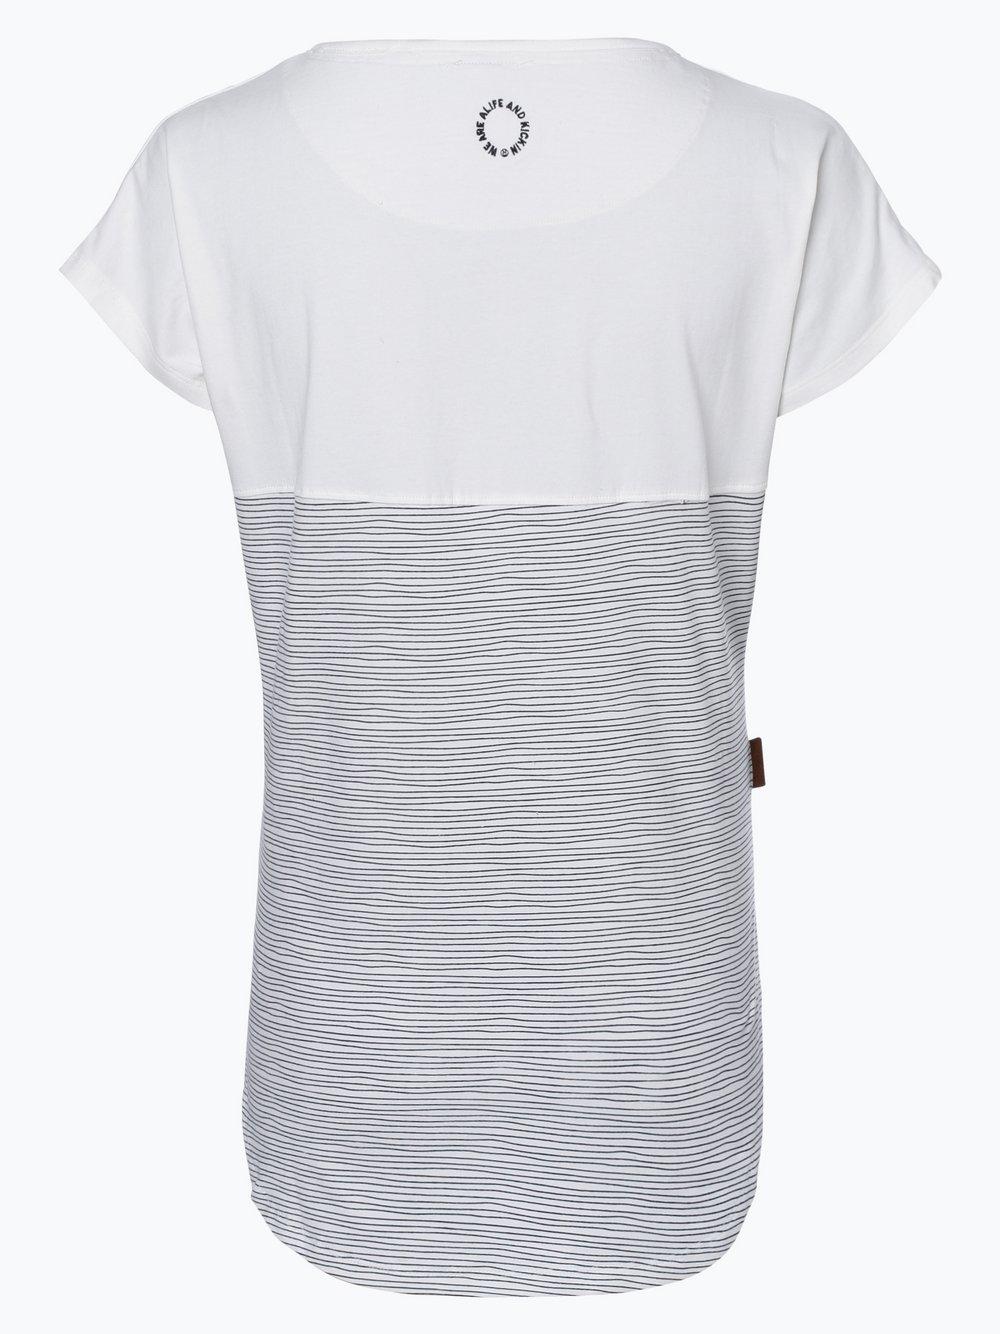 Damen T-Shirt - Summer B blau Alife & Kickin FGWbrWifg3